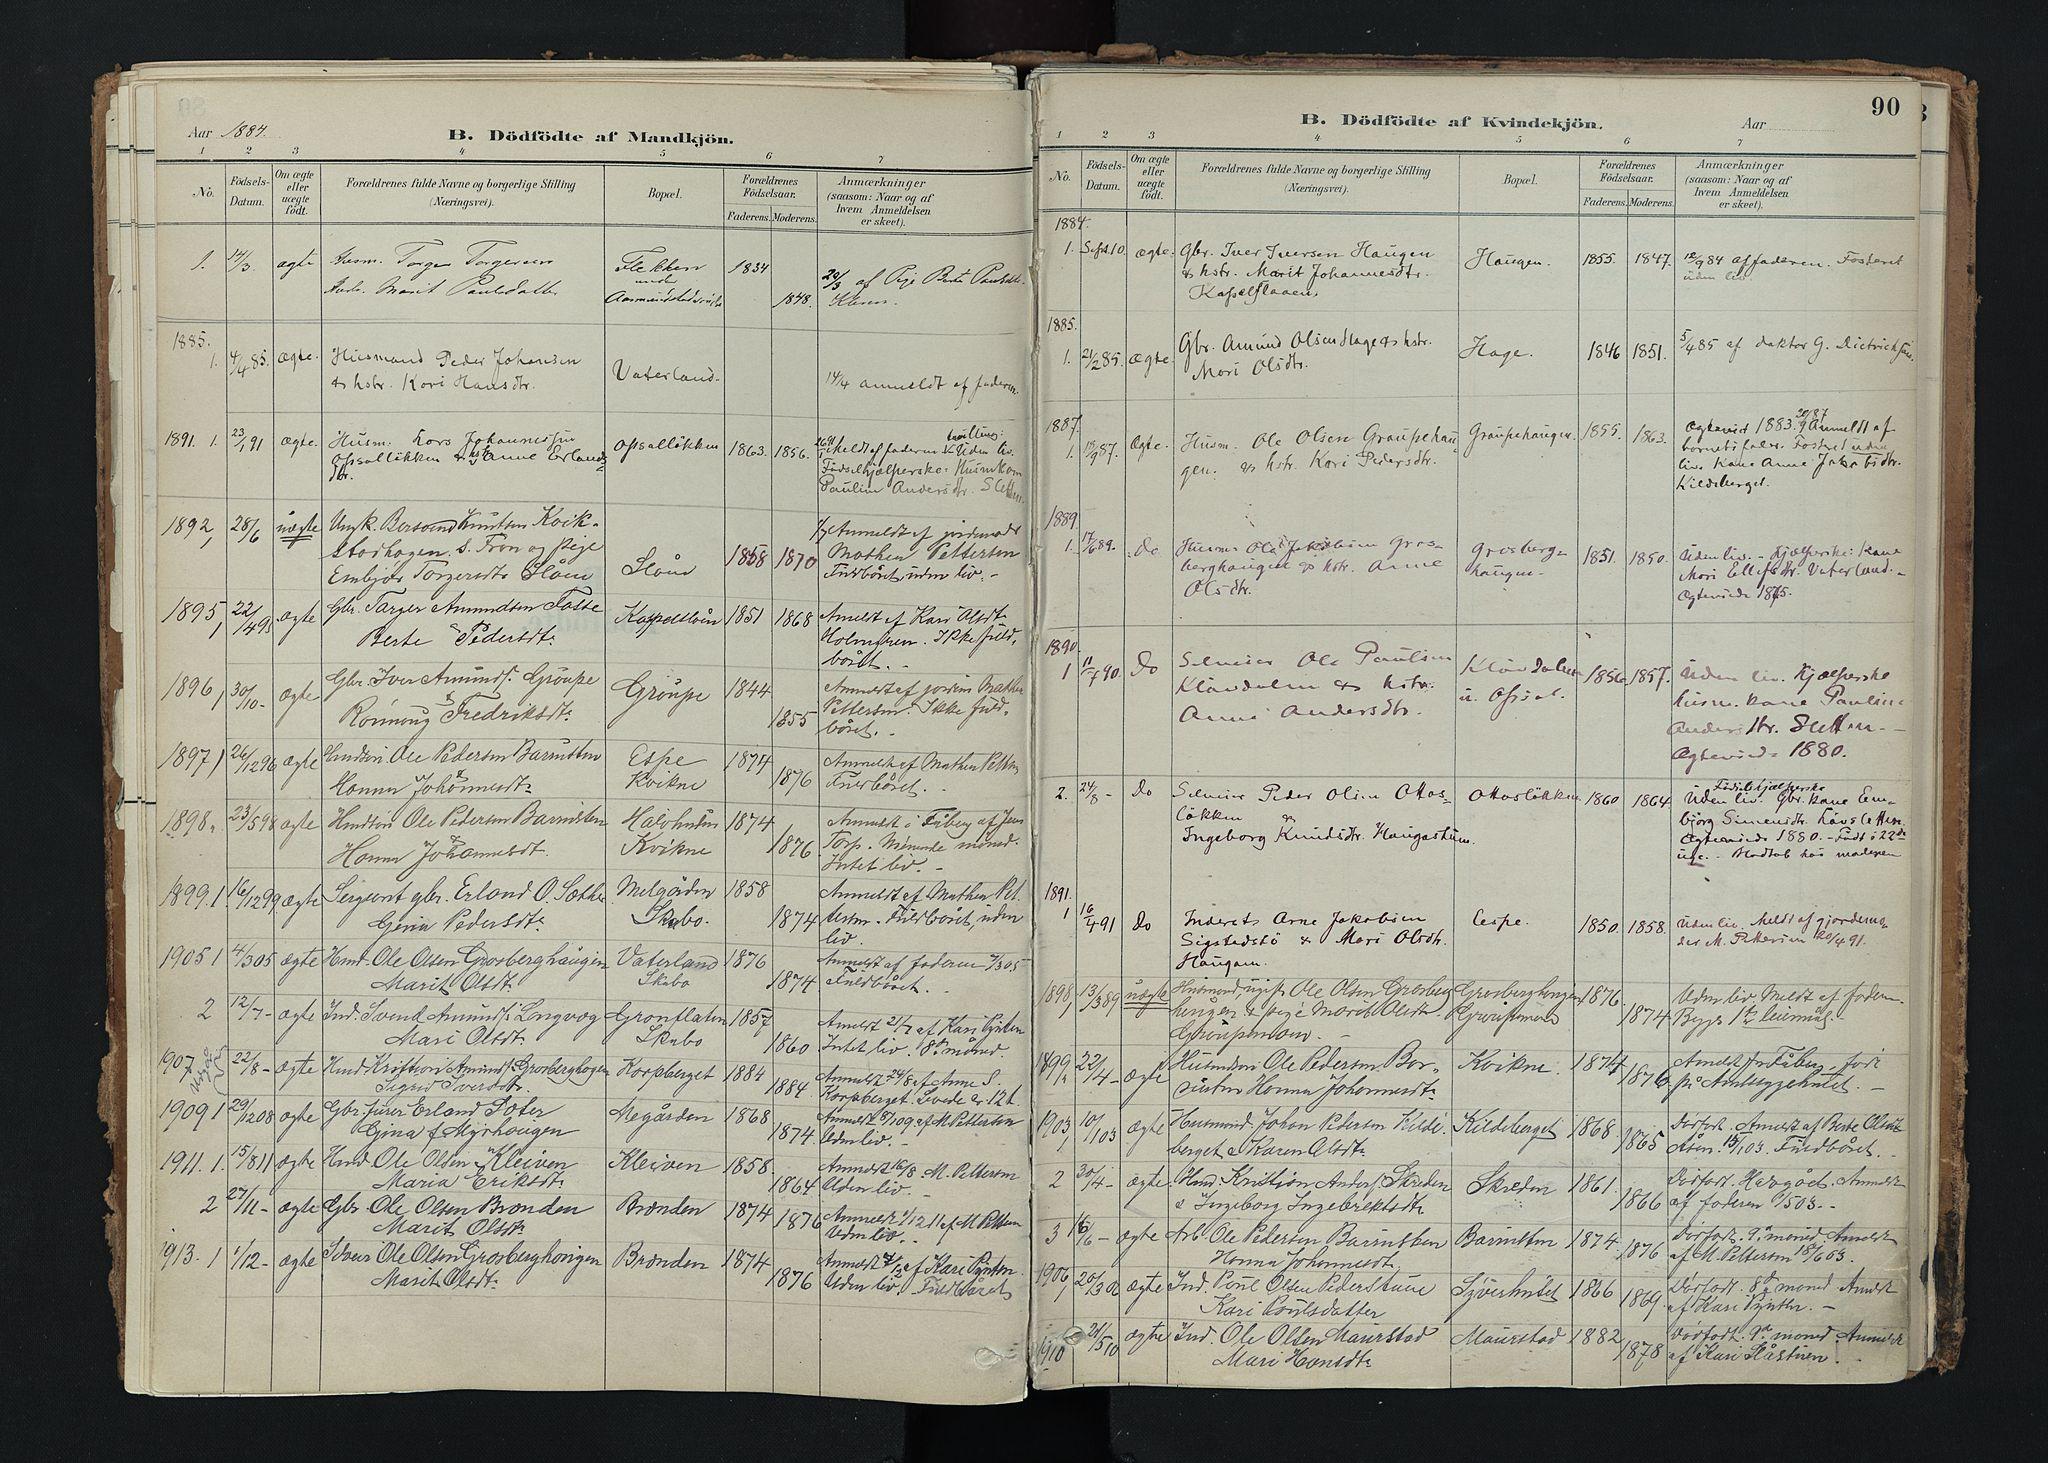 SAH, Nord-Fron prestekontor, Ministerialbok nr. 5, 1884-1914, s. 90